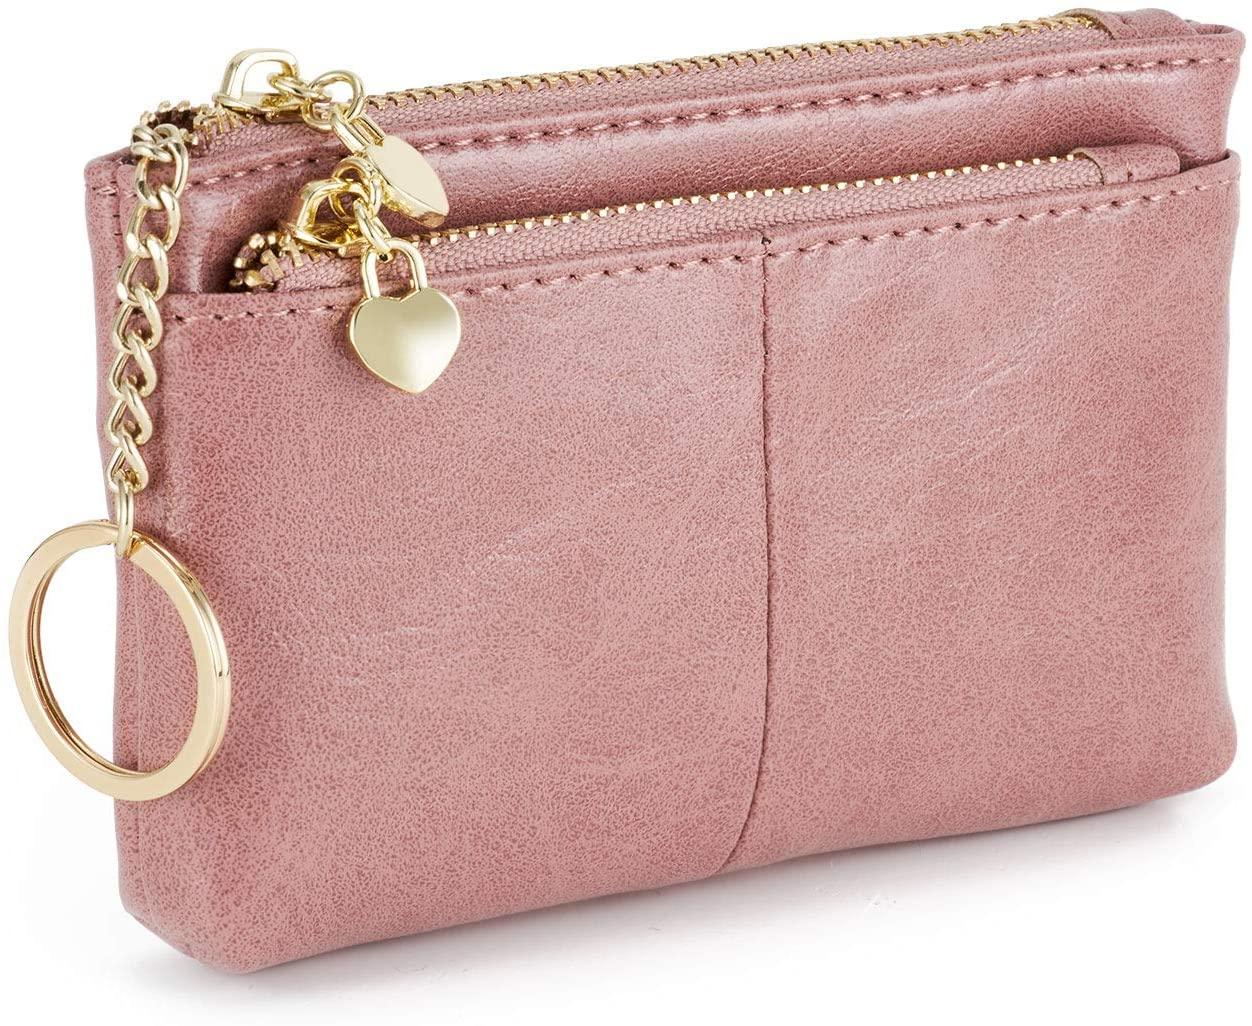 ZOOEASS Women PU Leather Zip Mini Coin Purse With Key Ring Triple Zipper Card Holder Wallet (Pink)